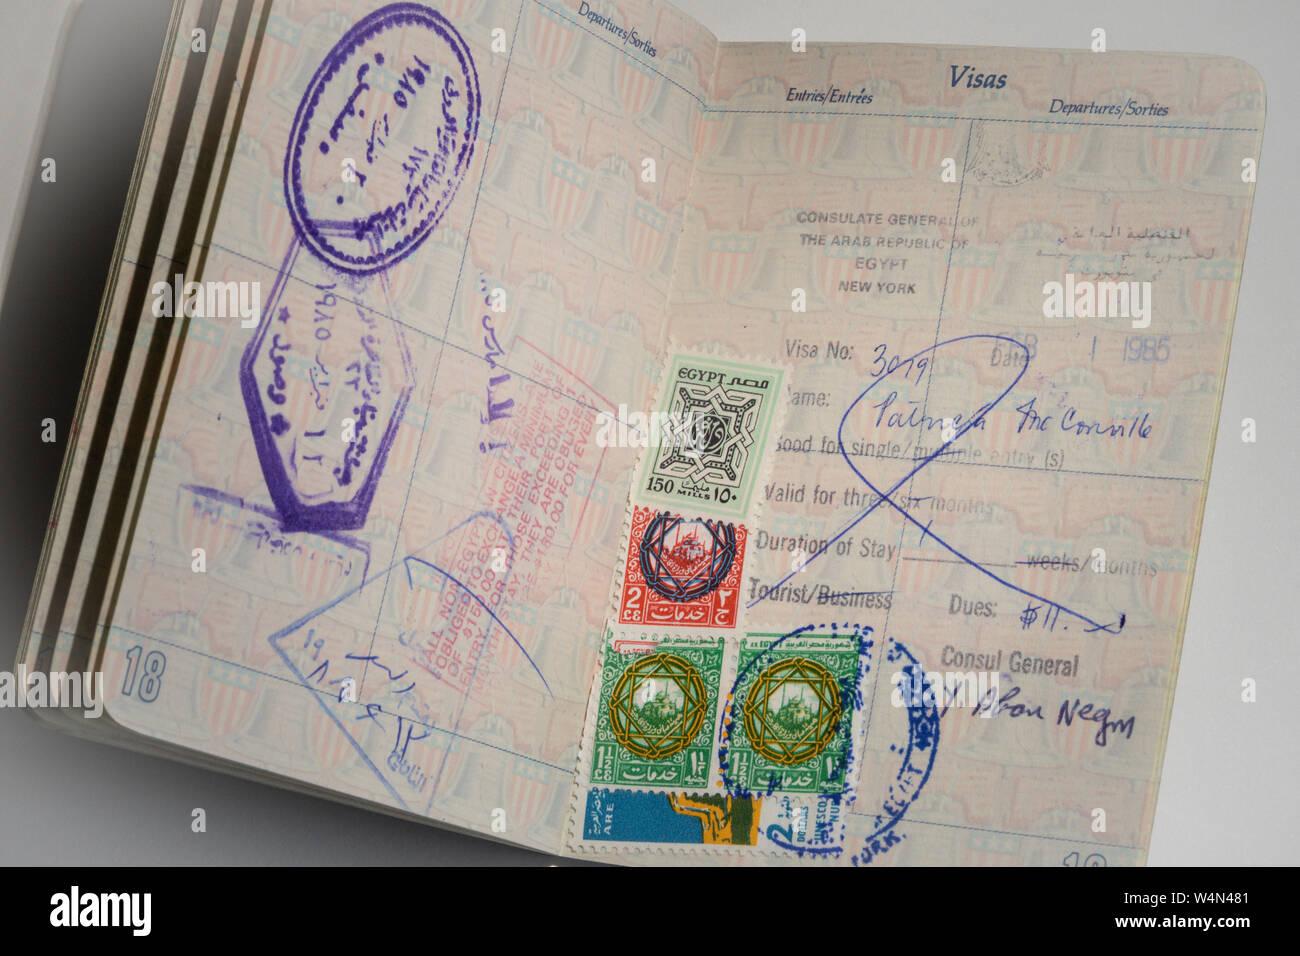 Visa Stamps Stock Photos & Visa Stamps Stock Images - Alamy